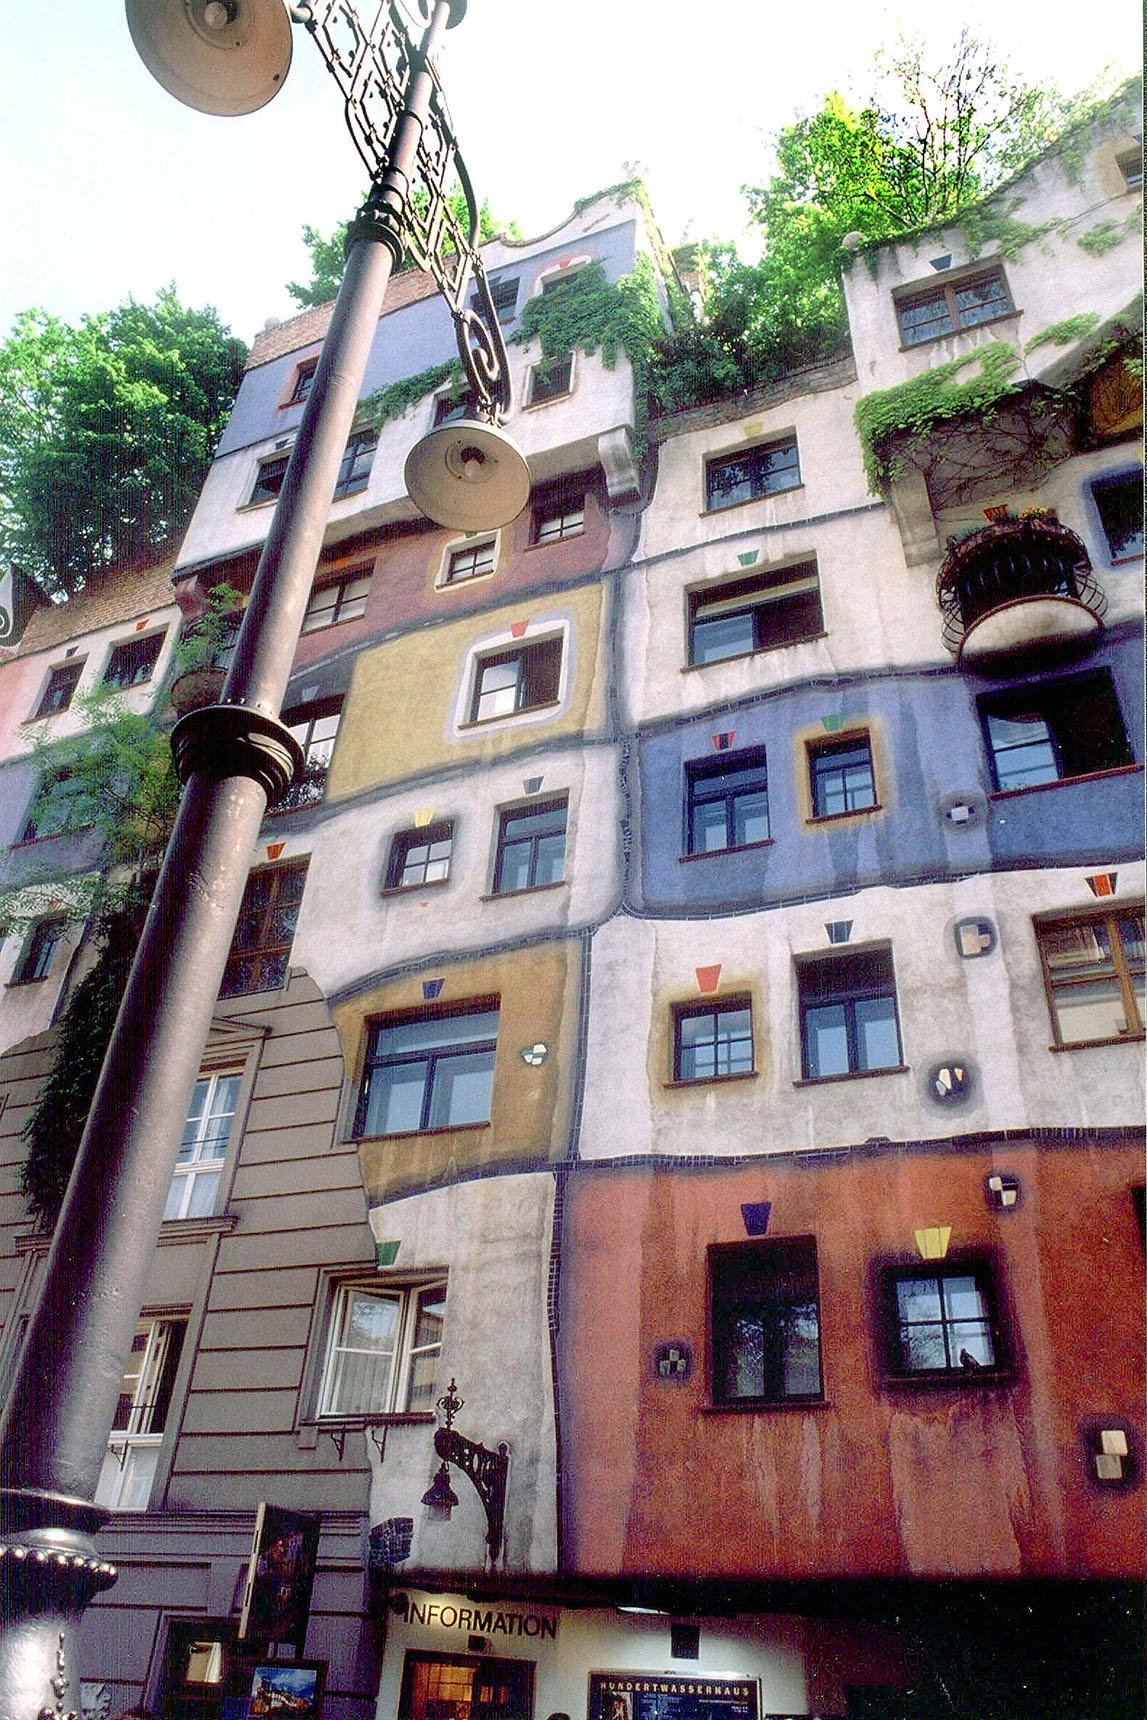 Vienna+-+Hundertwasser+House.jpg